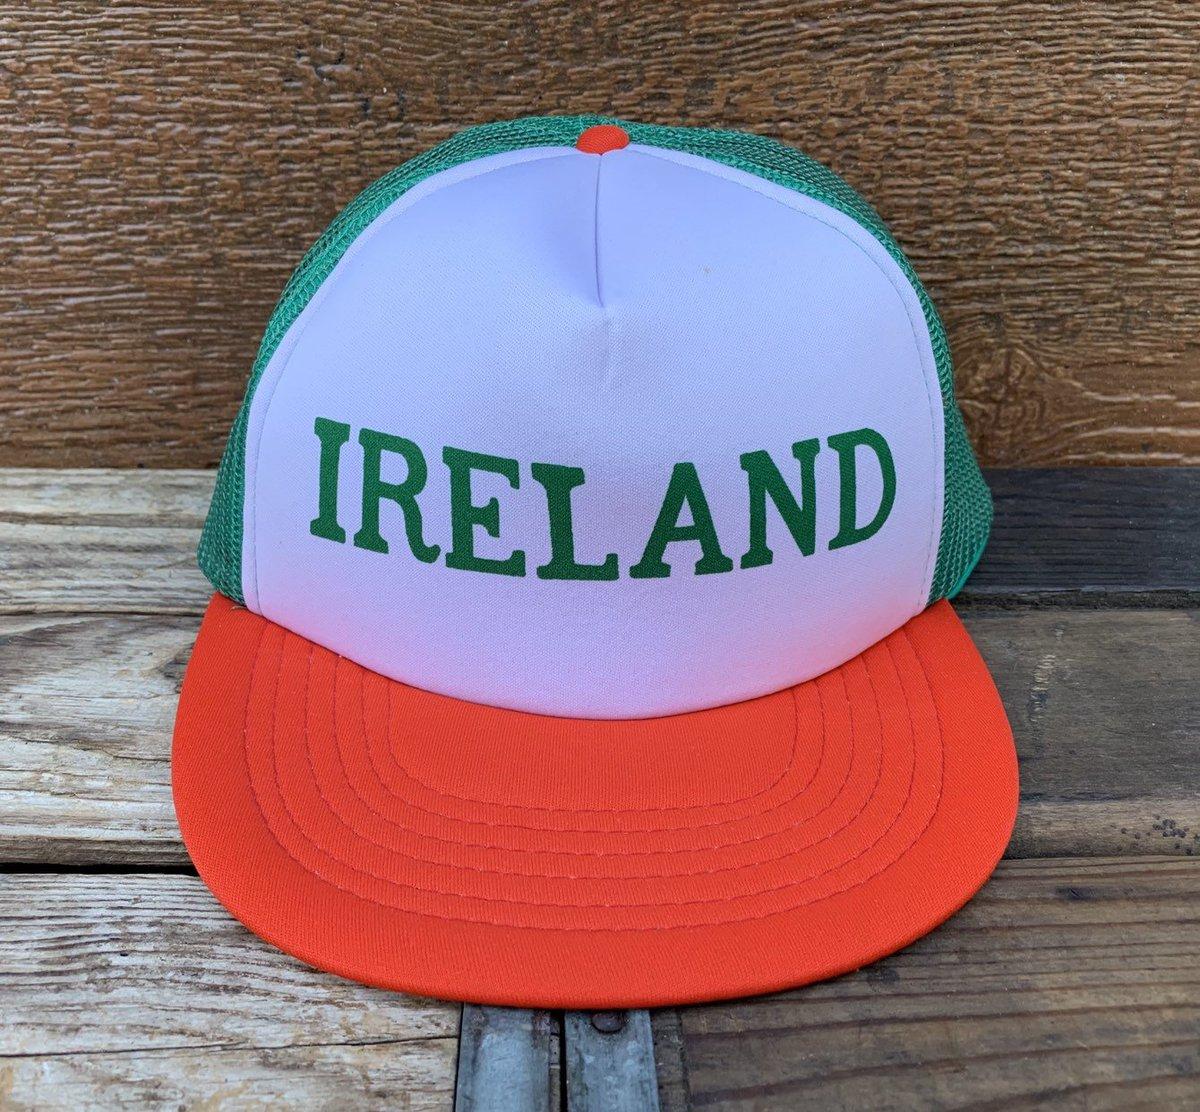 5b5dd4279b5 Ireland vintage irish pride wide brim snapback trucker hat jpg 1200x1112 Vintage  snapback etsy trucker mesh